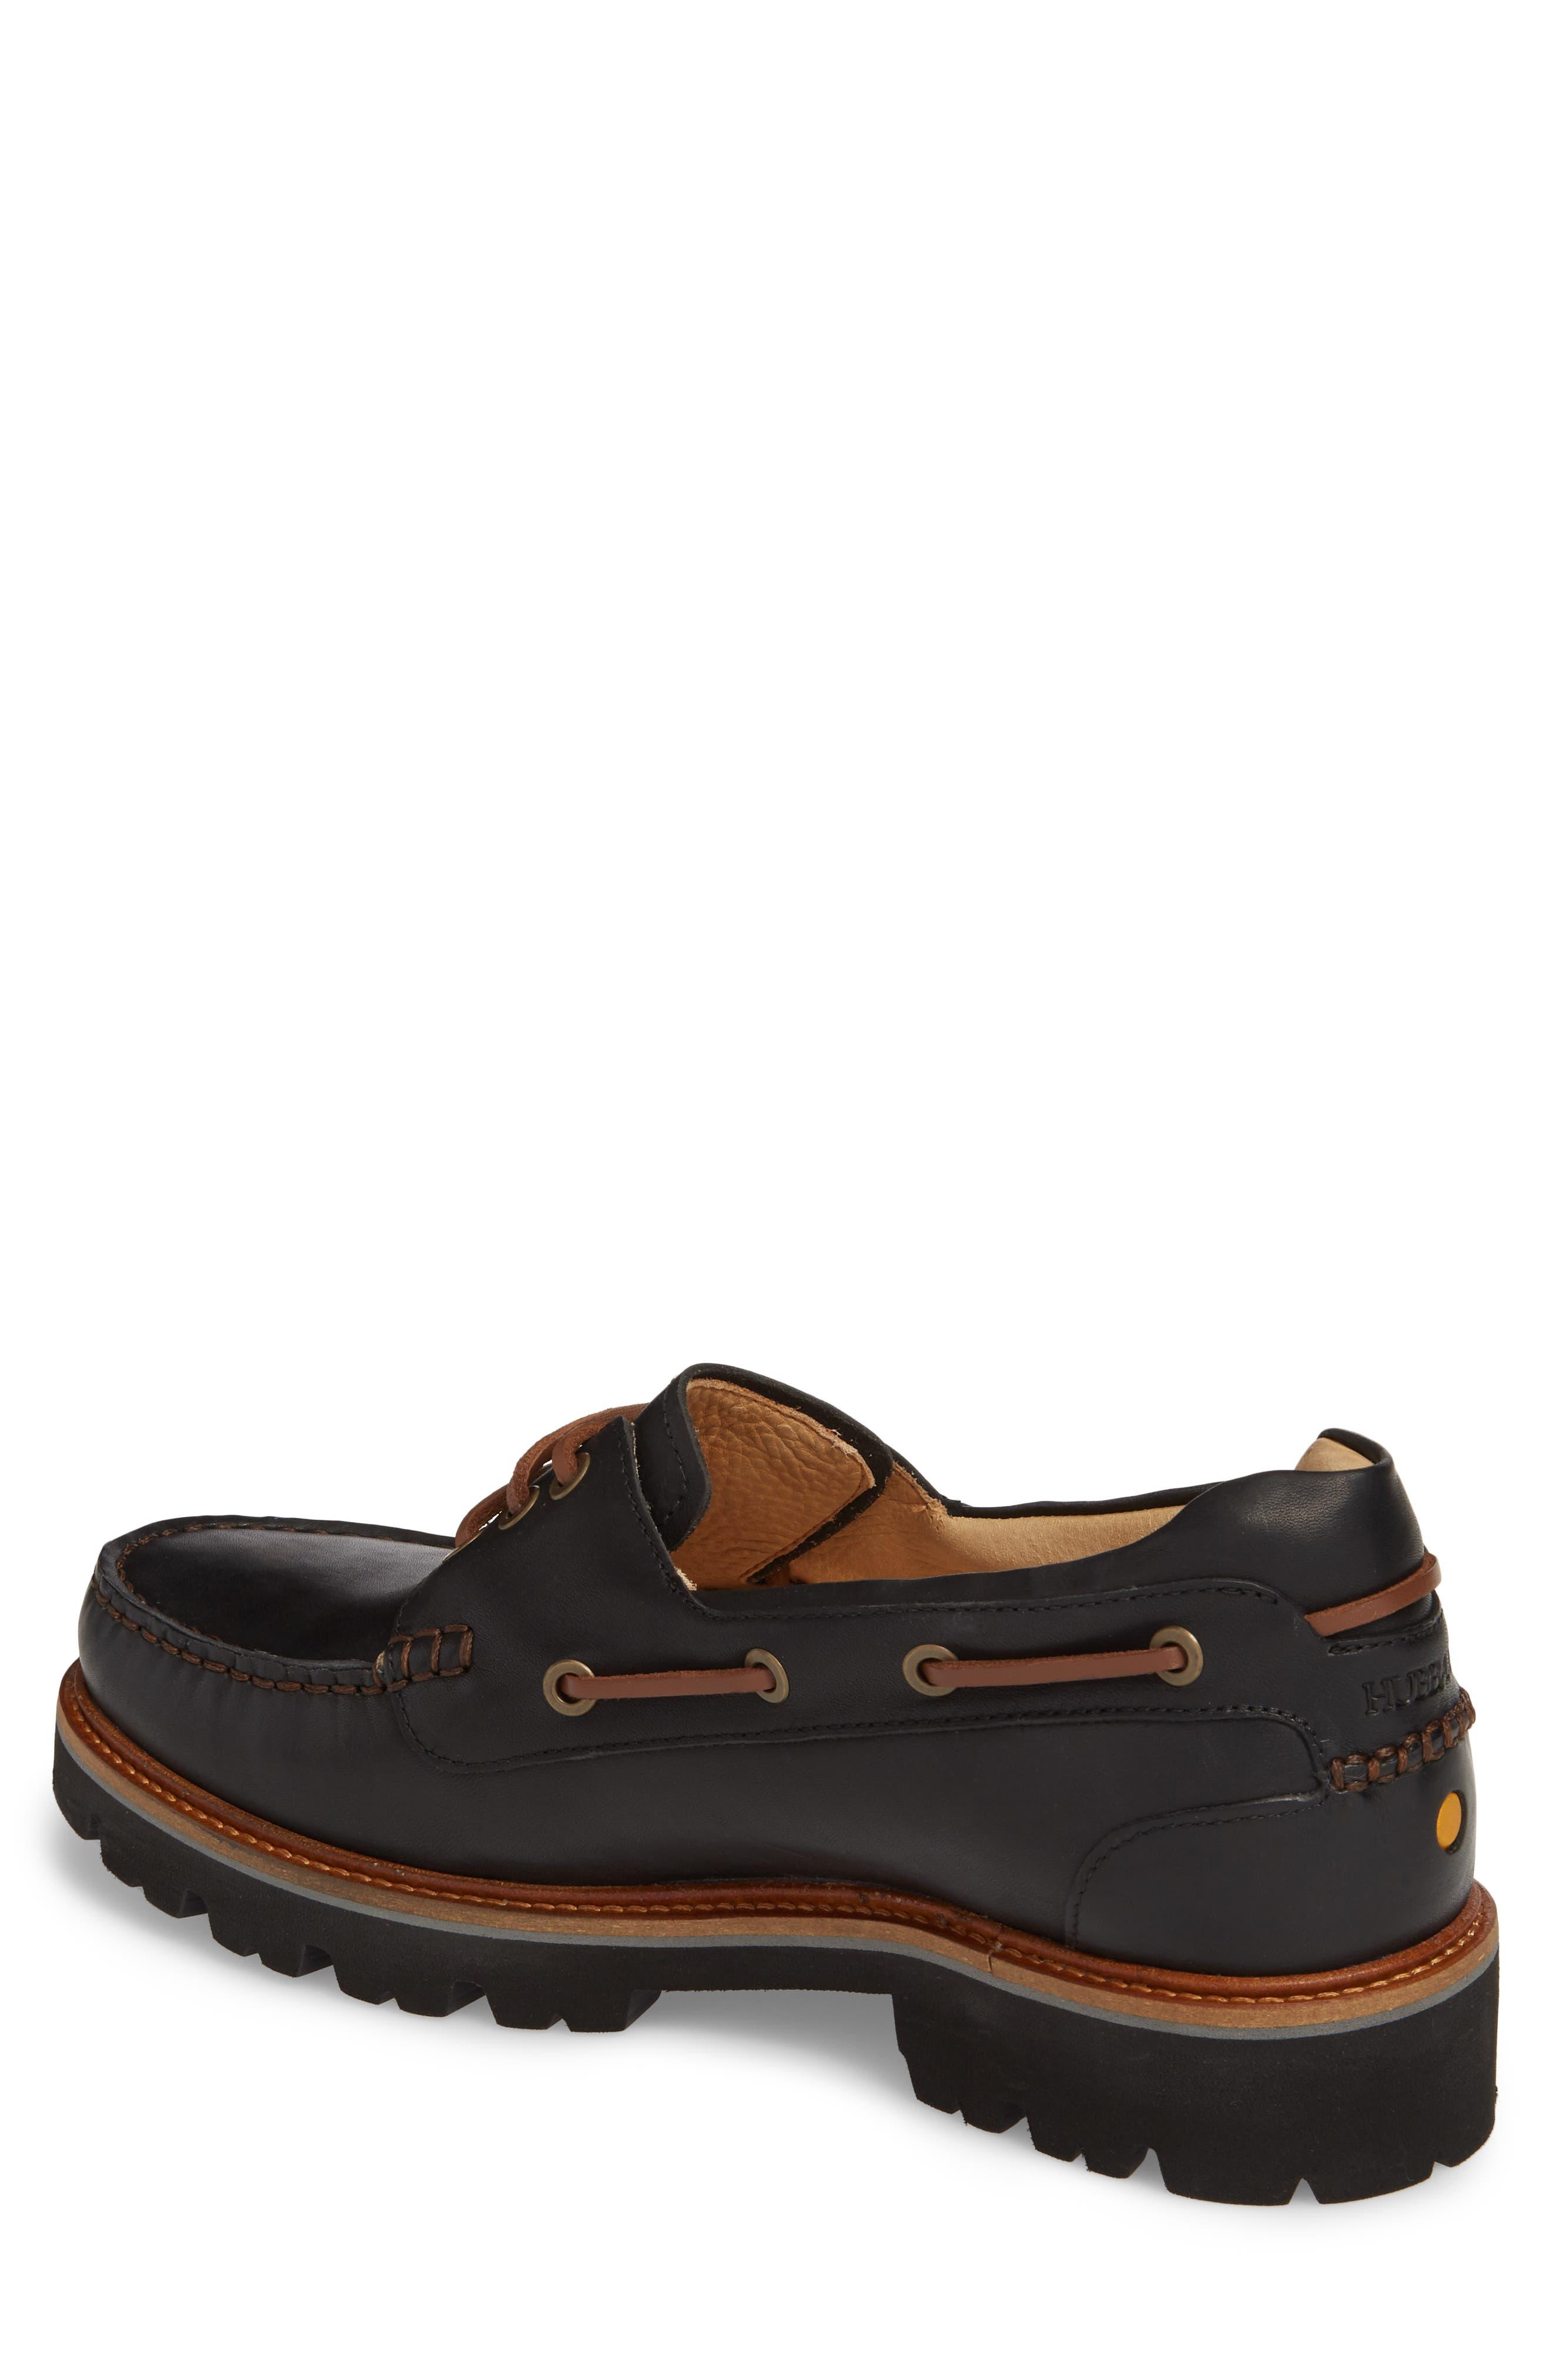 Camplight Water Resistant Boat Shoe,                             Alternate thumbnail 2, color,                             Saddlebag Black Leather